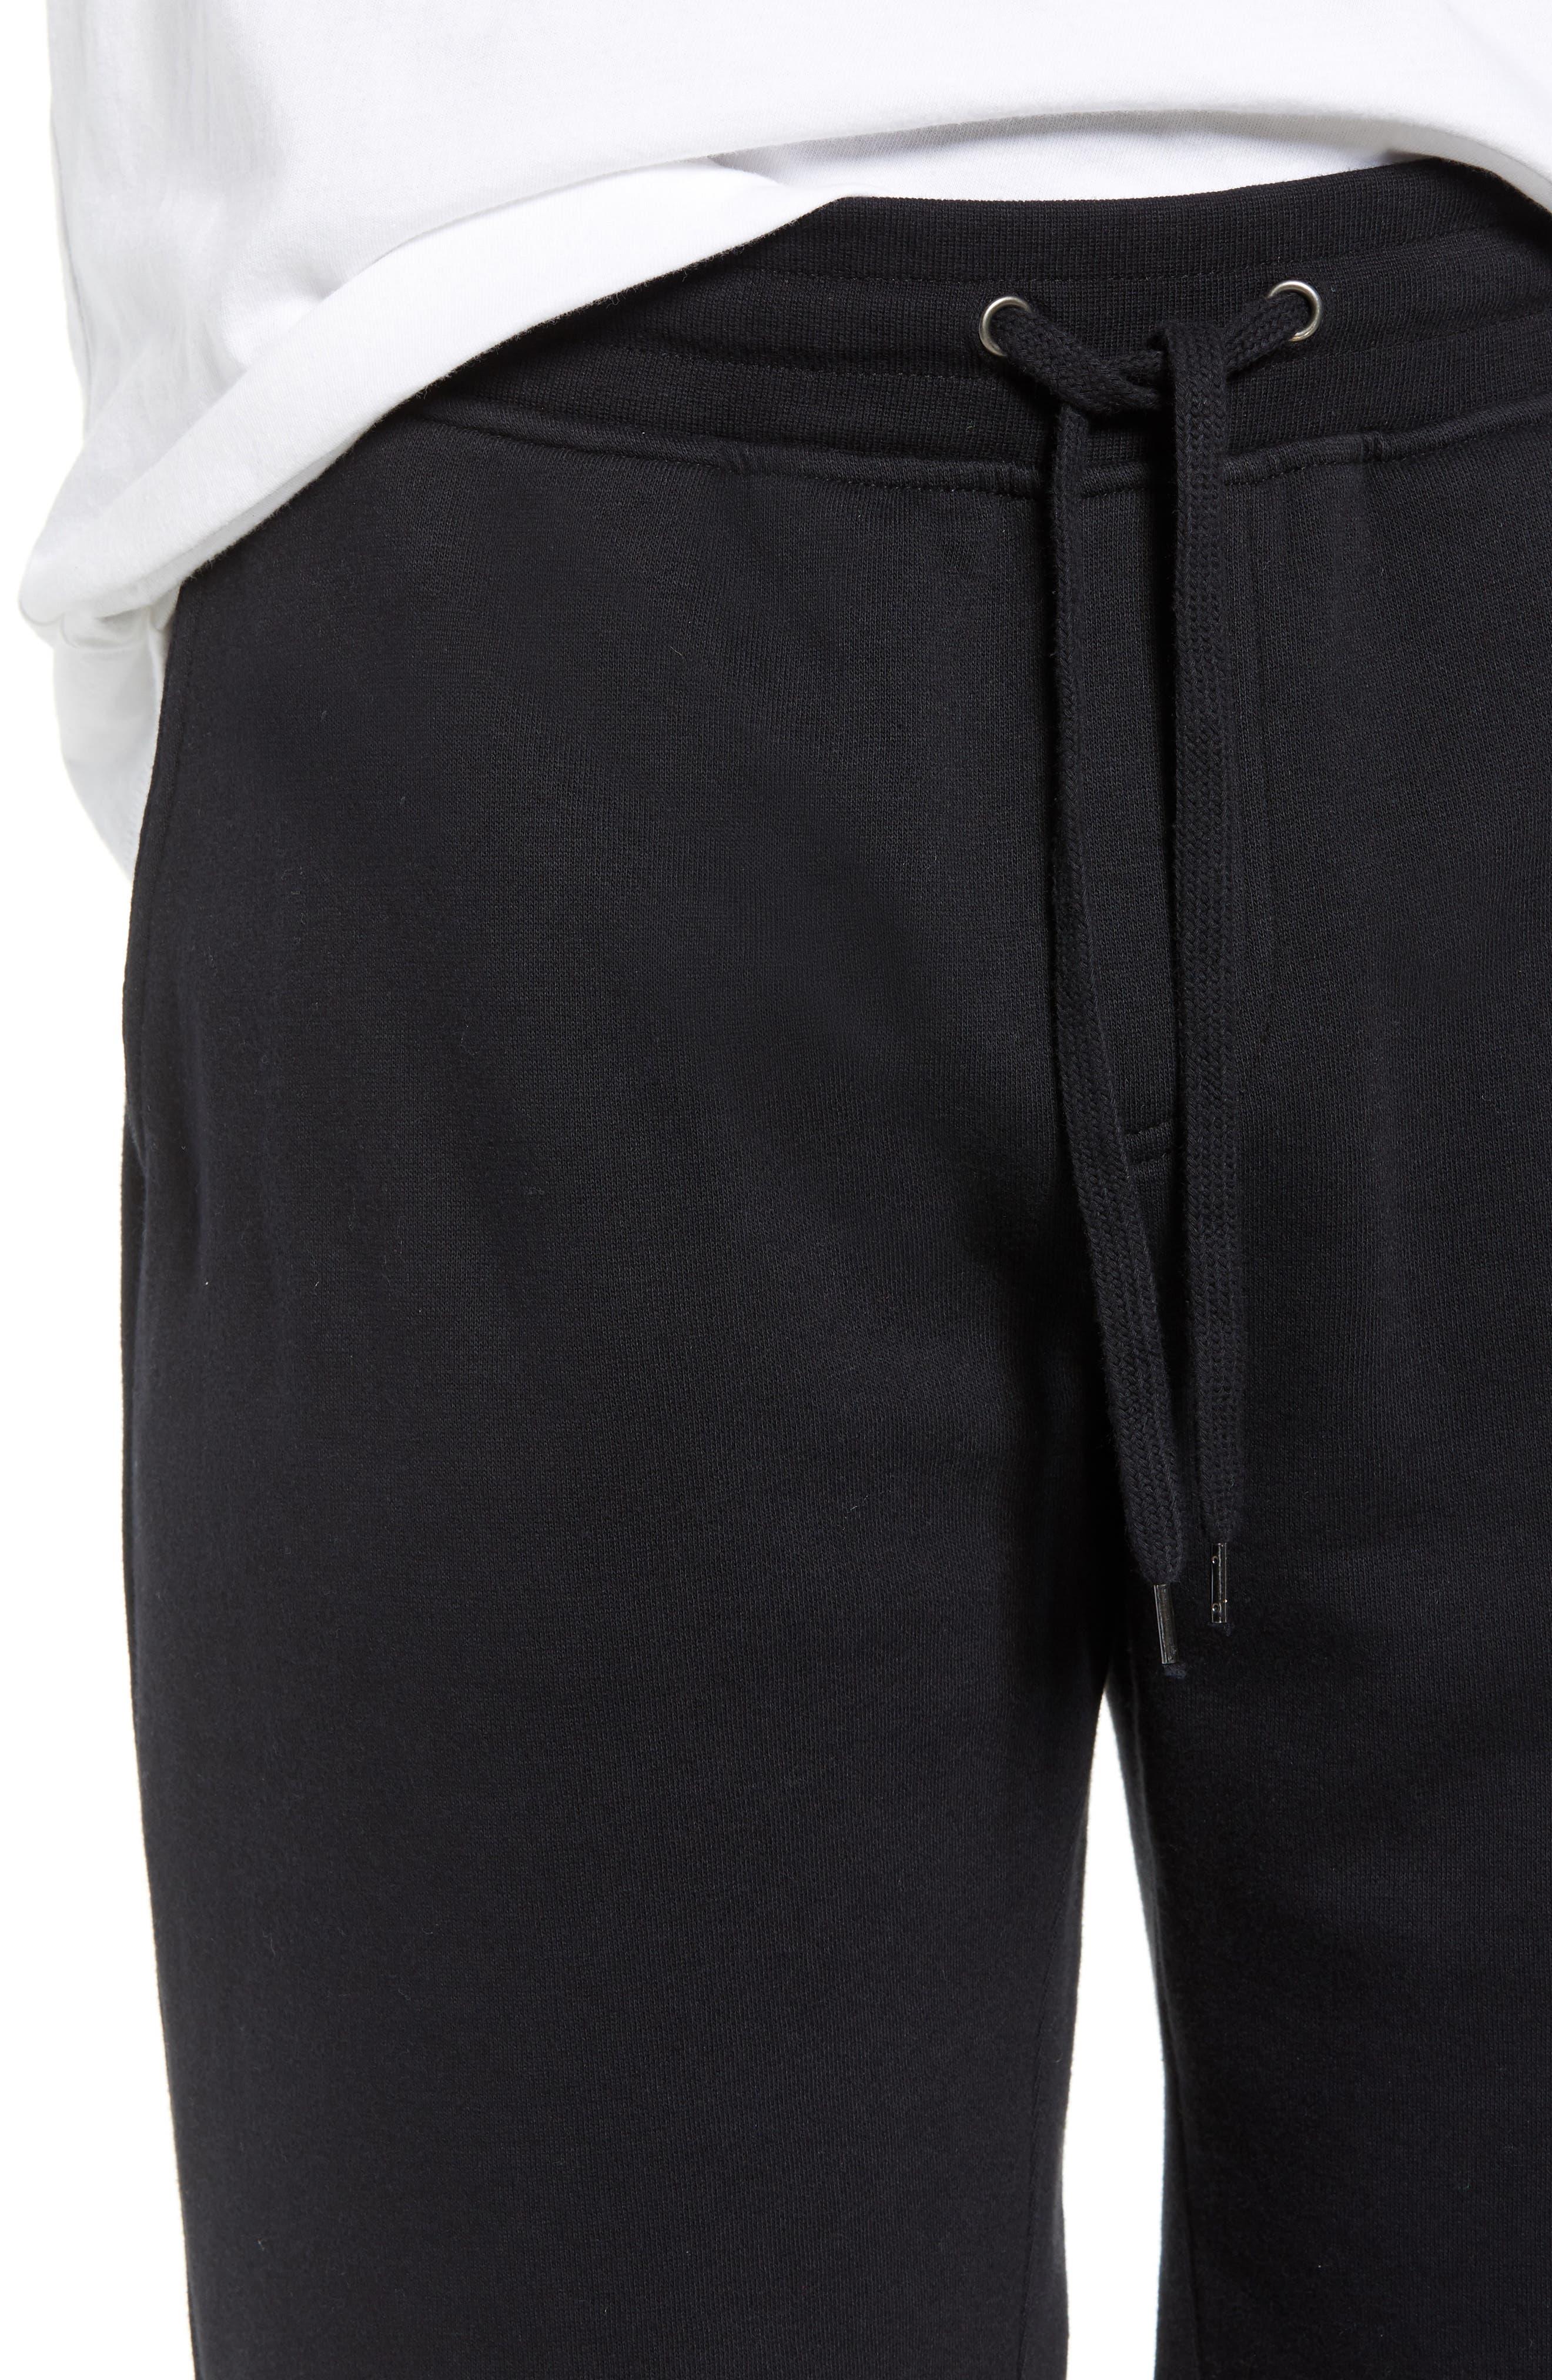 THE RAIL,                             Fleece Shorts,                             Alternate thumbnail 4, color,                             001